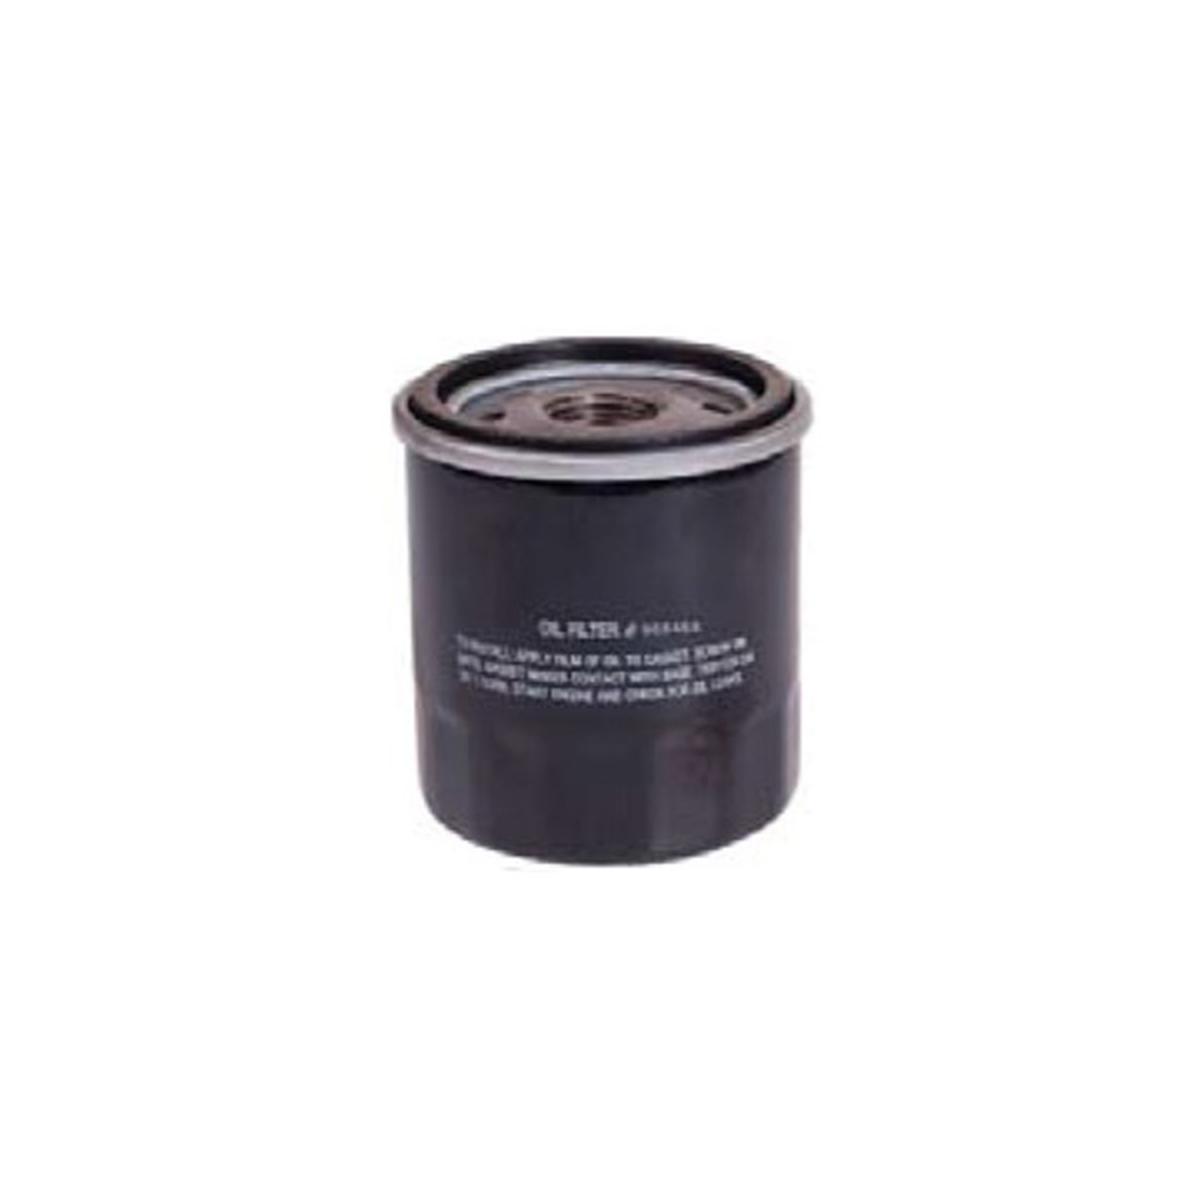 filters for dixie chopper lawn mowers generac diesel fuel filter 0042703